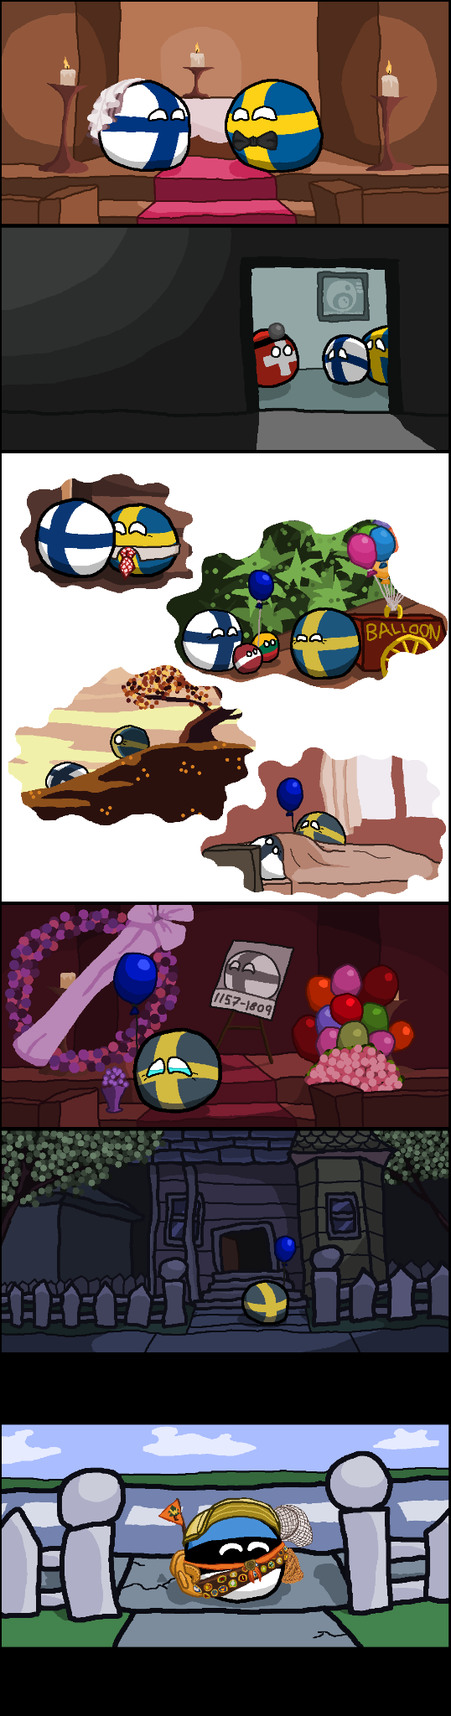 Rip finland - meme